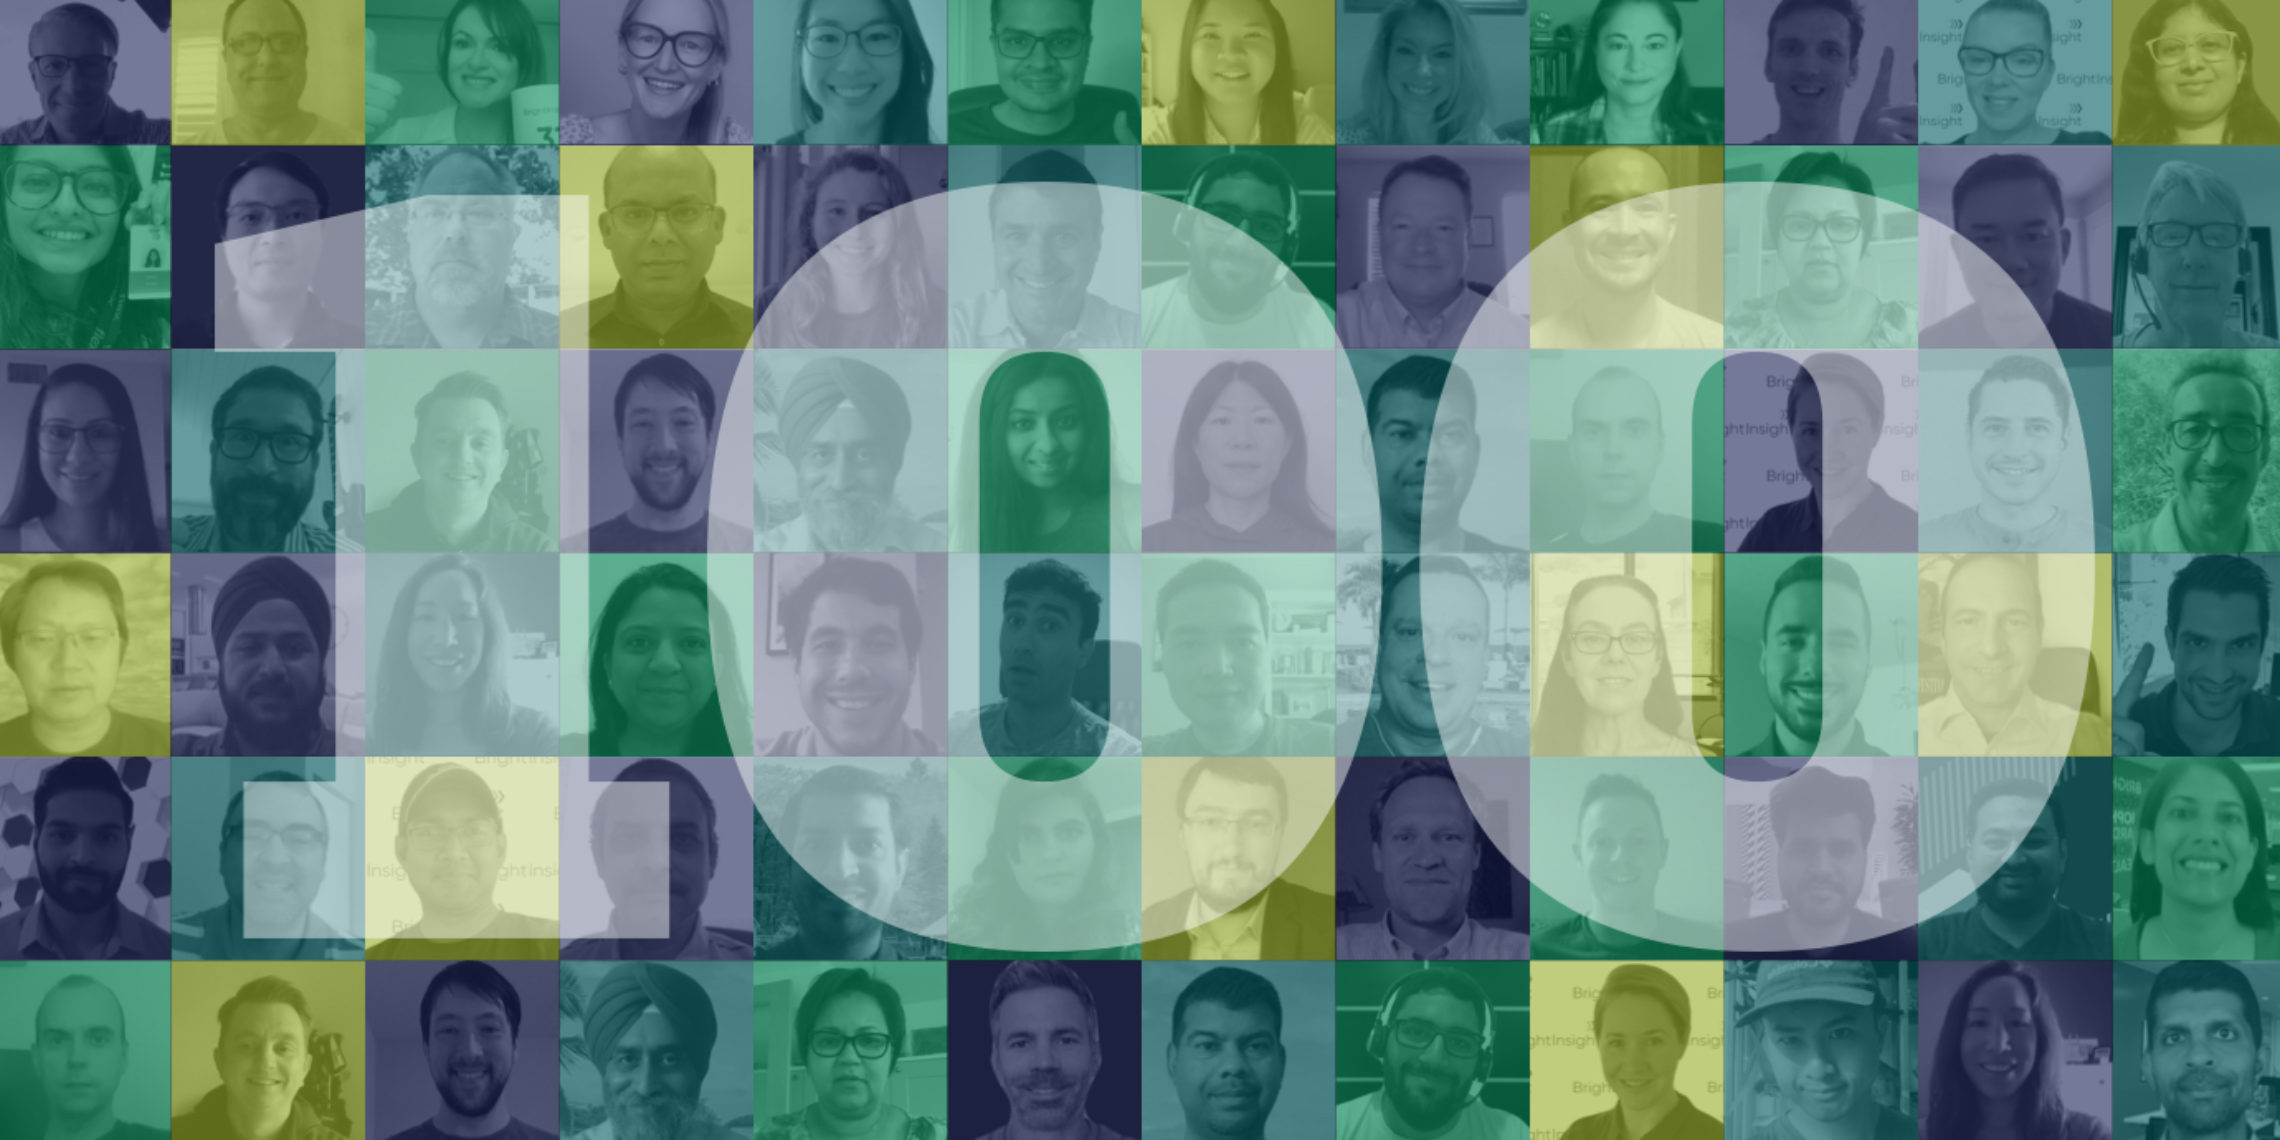 100 Employees Milestone Blog img 345x345 2x